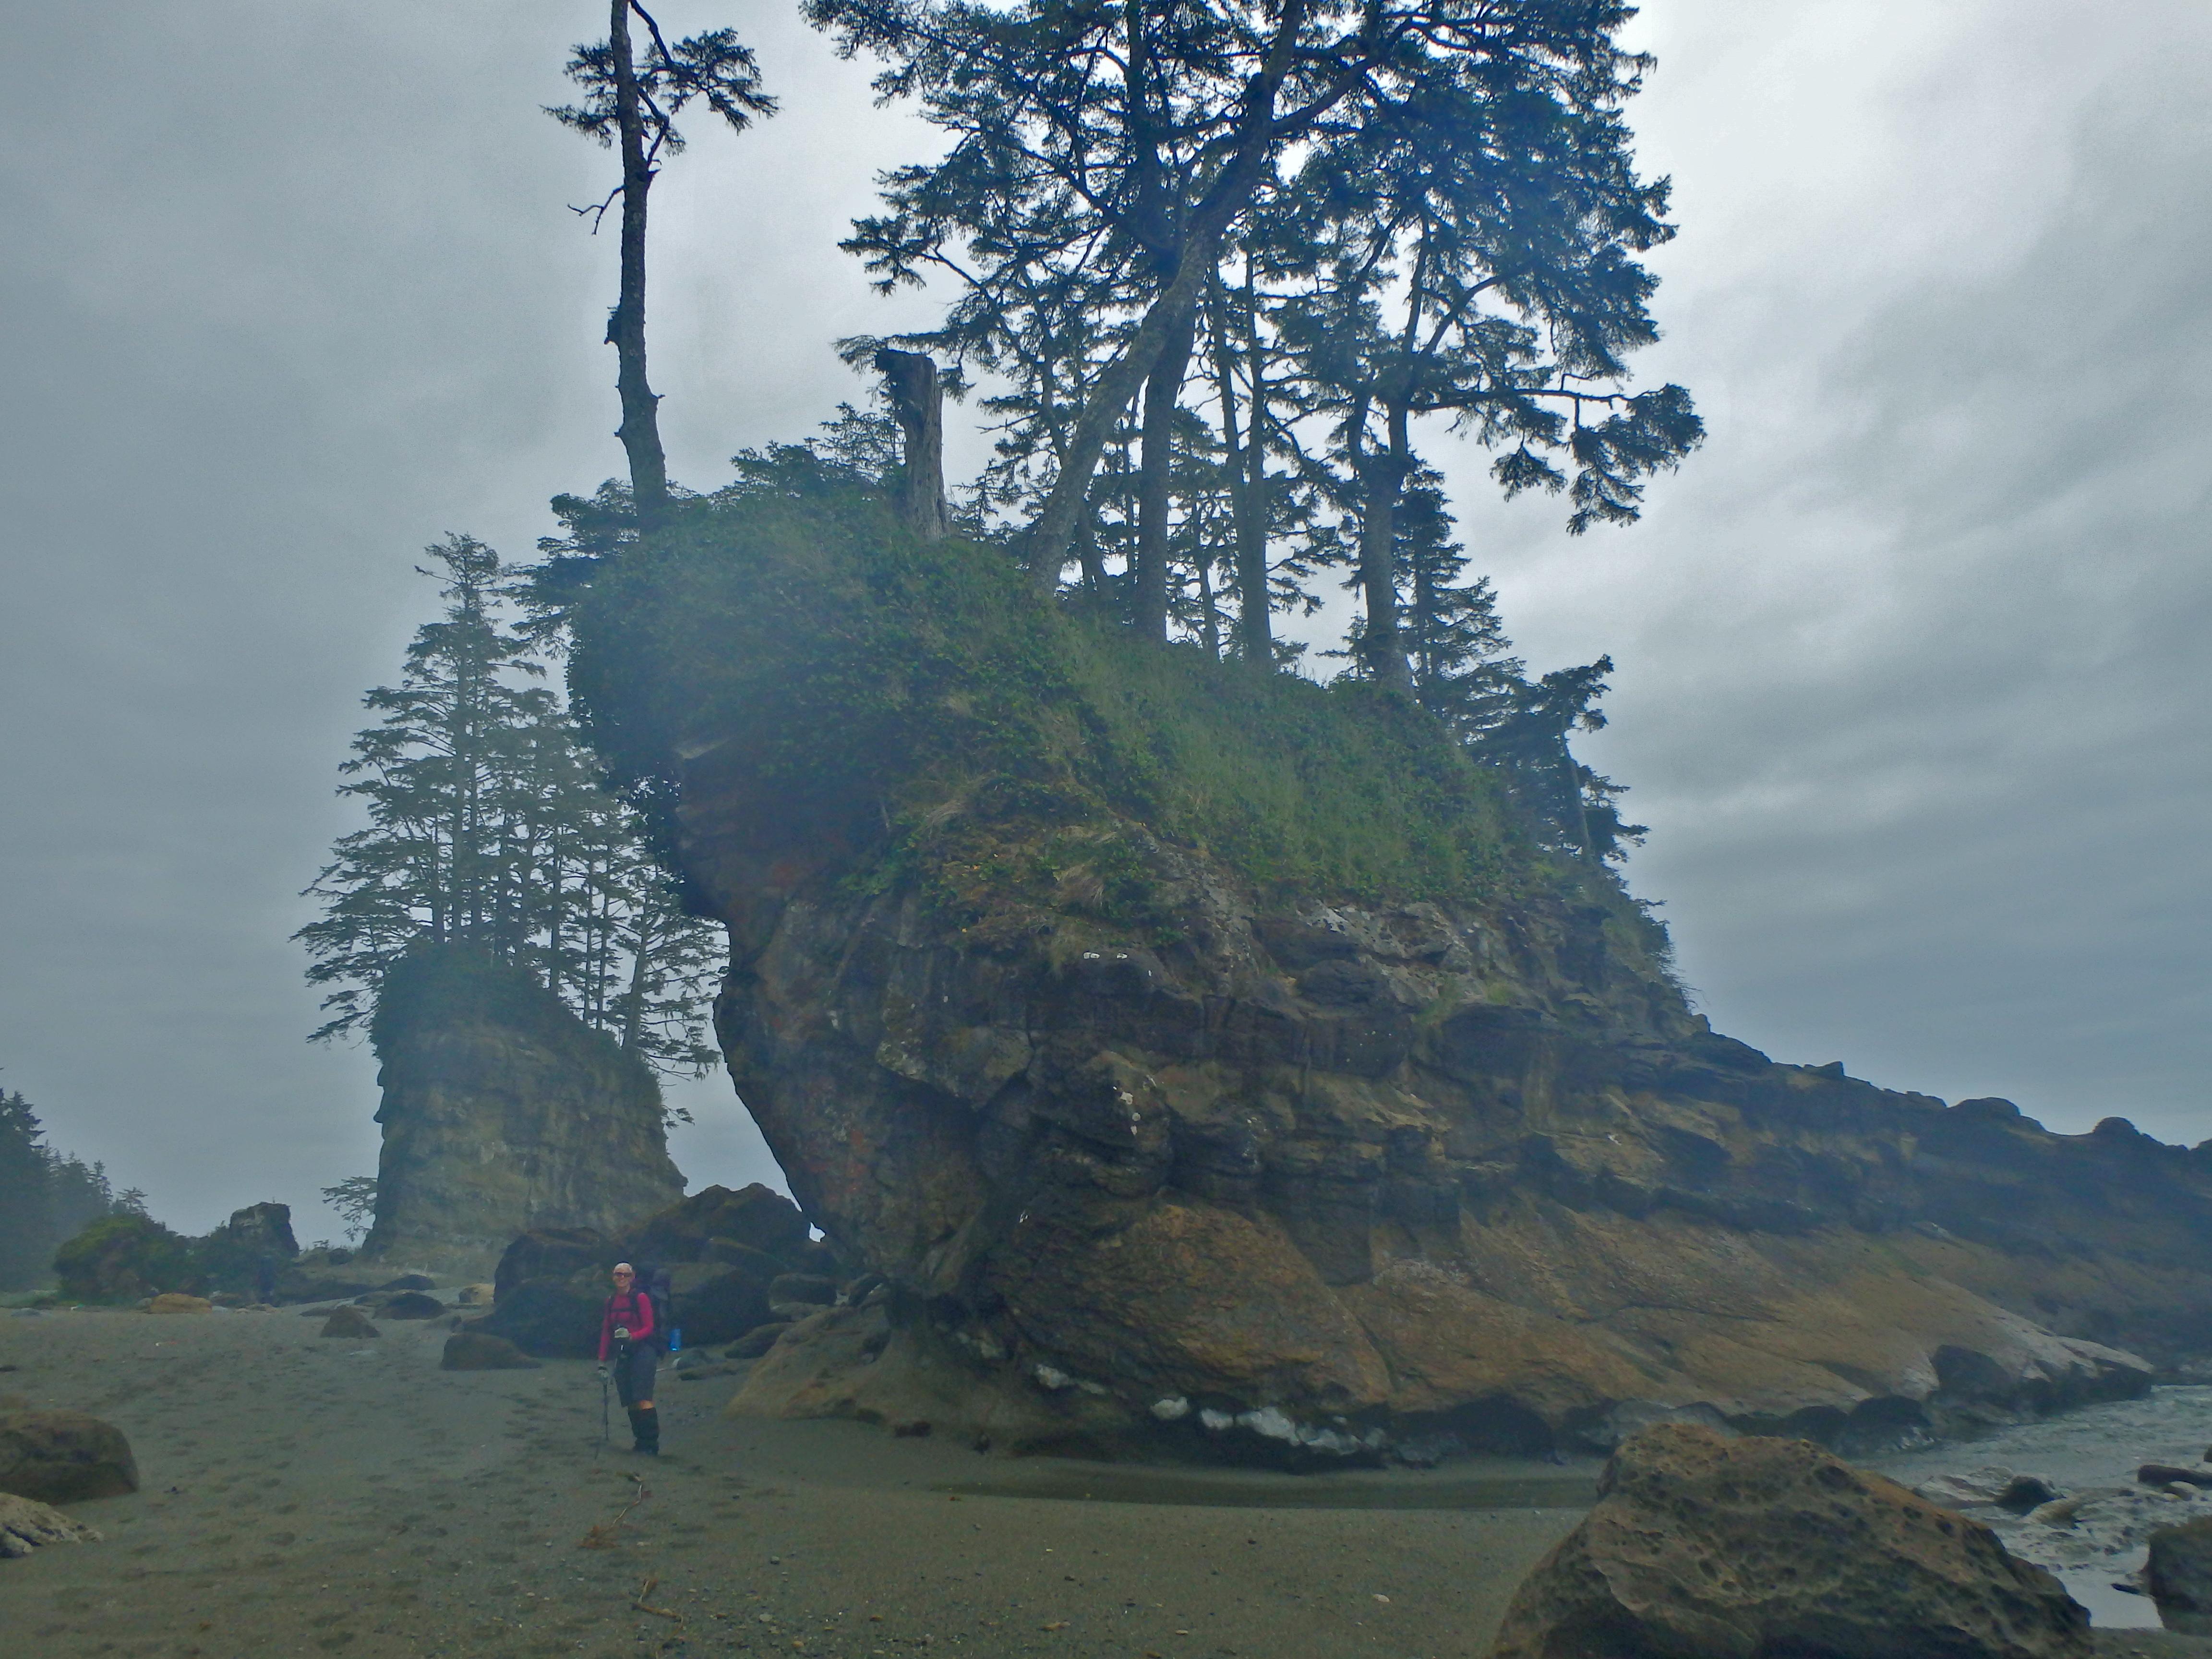 West Coast Trail preparation